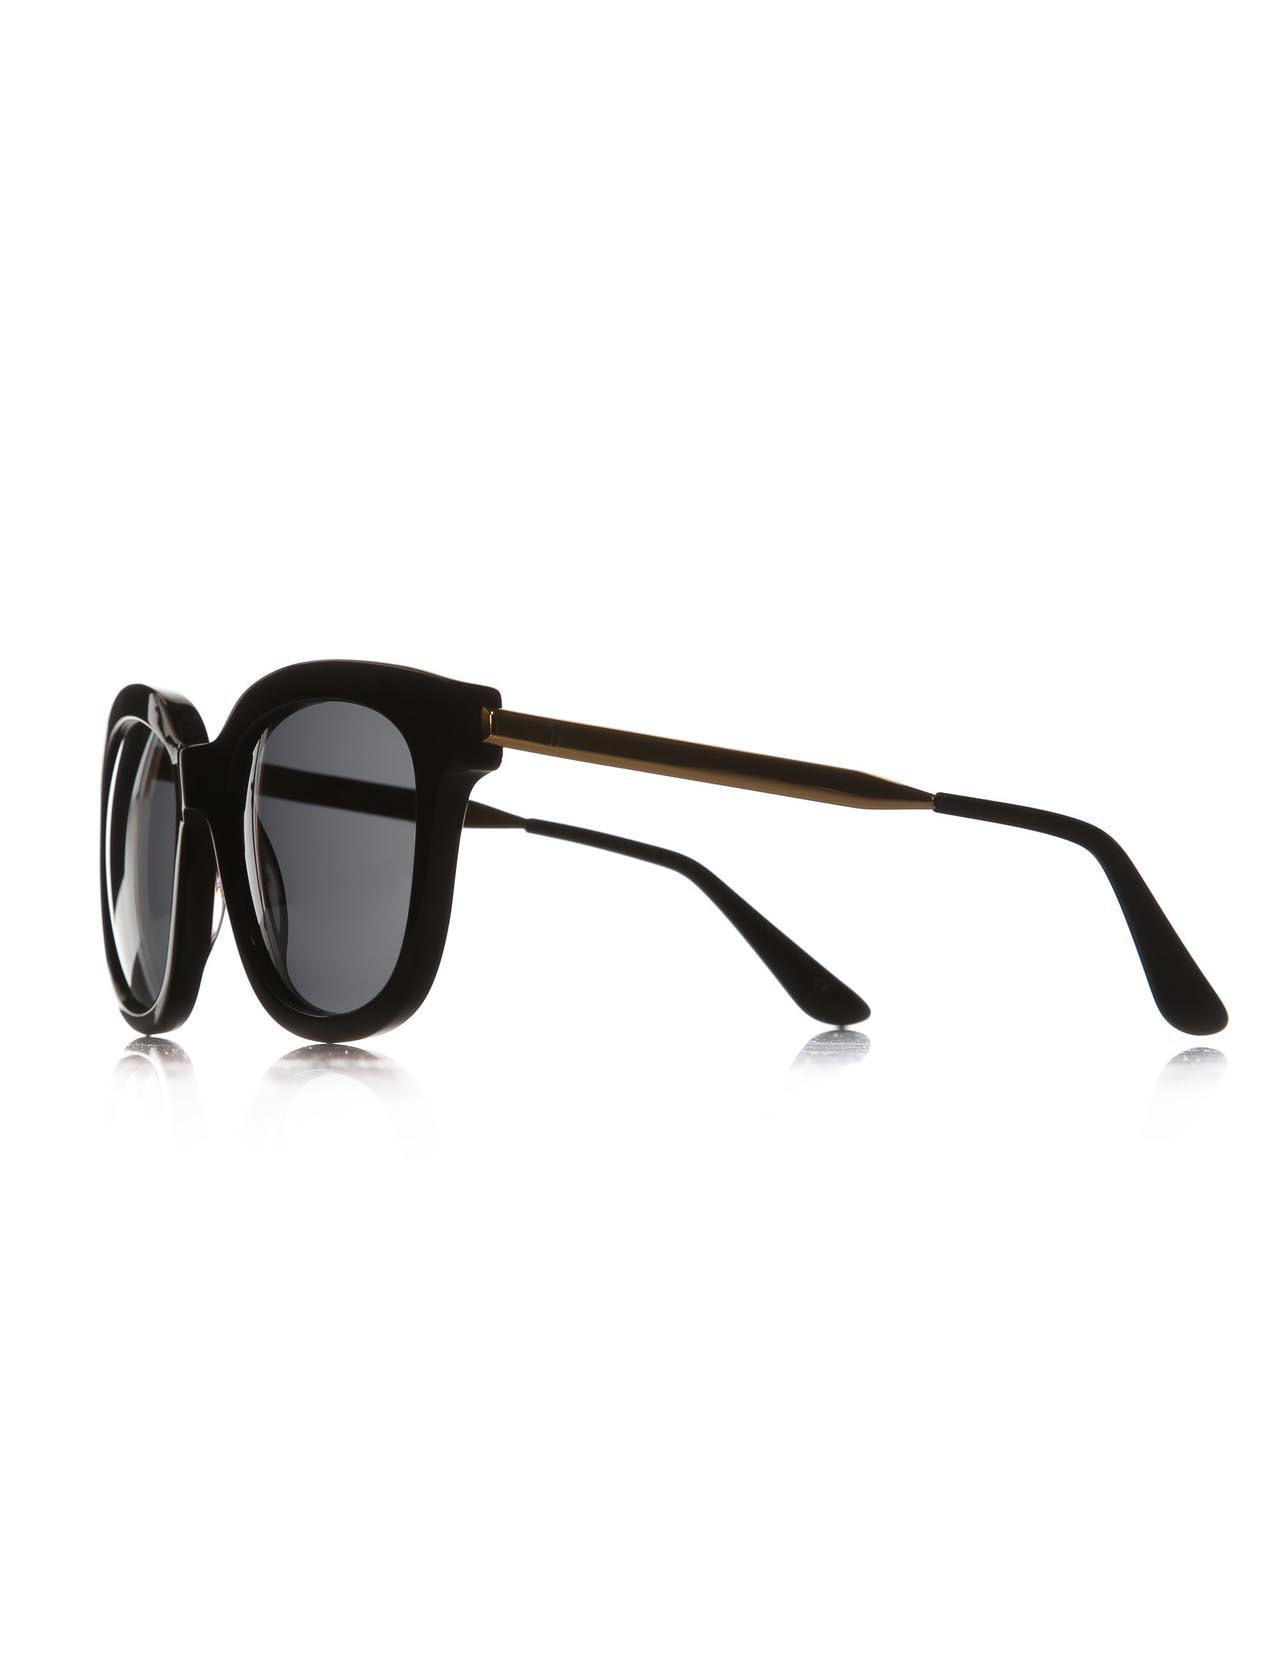 Women's sunglasses rh 15773 04 bone black organic rectangle rectangular 54-21-150 rachel